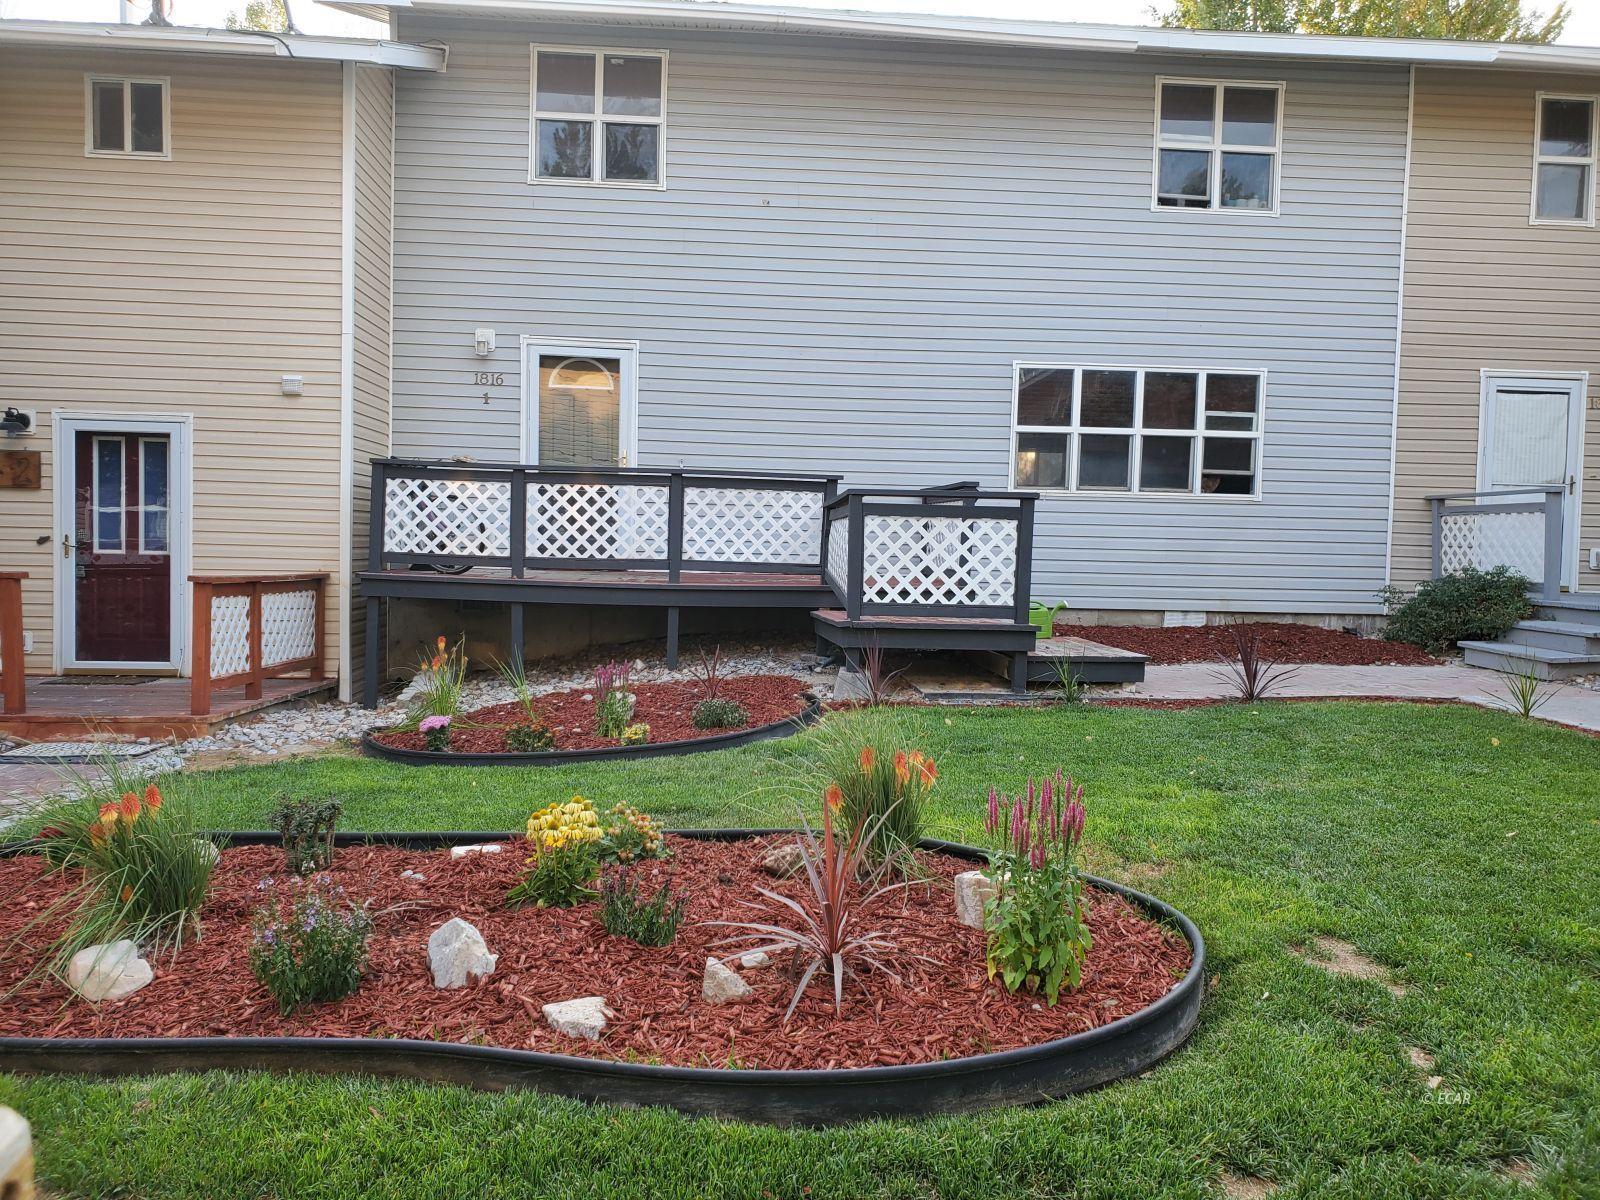 1816 Butte Street 1 Property Photo 11